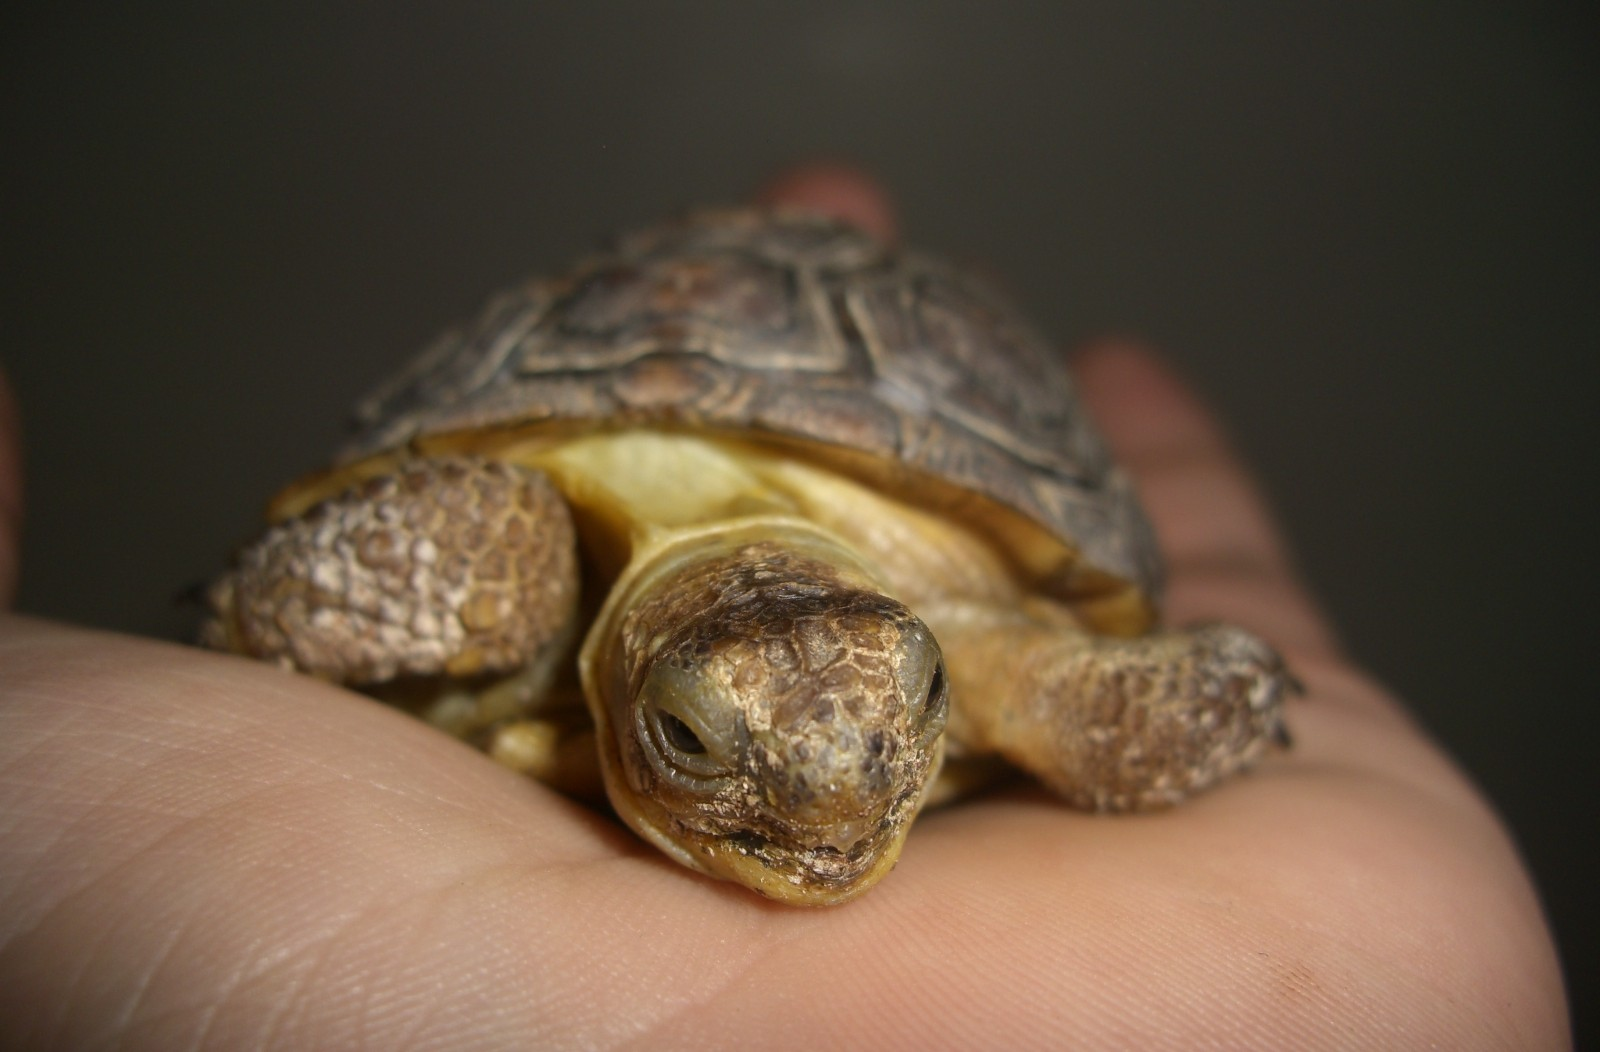 Young_desert_tortoise